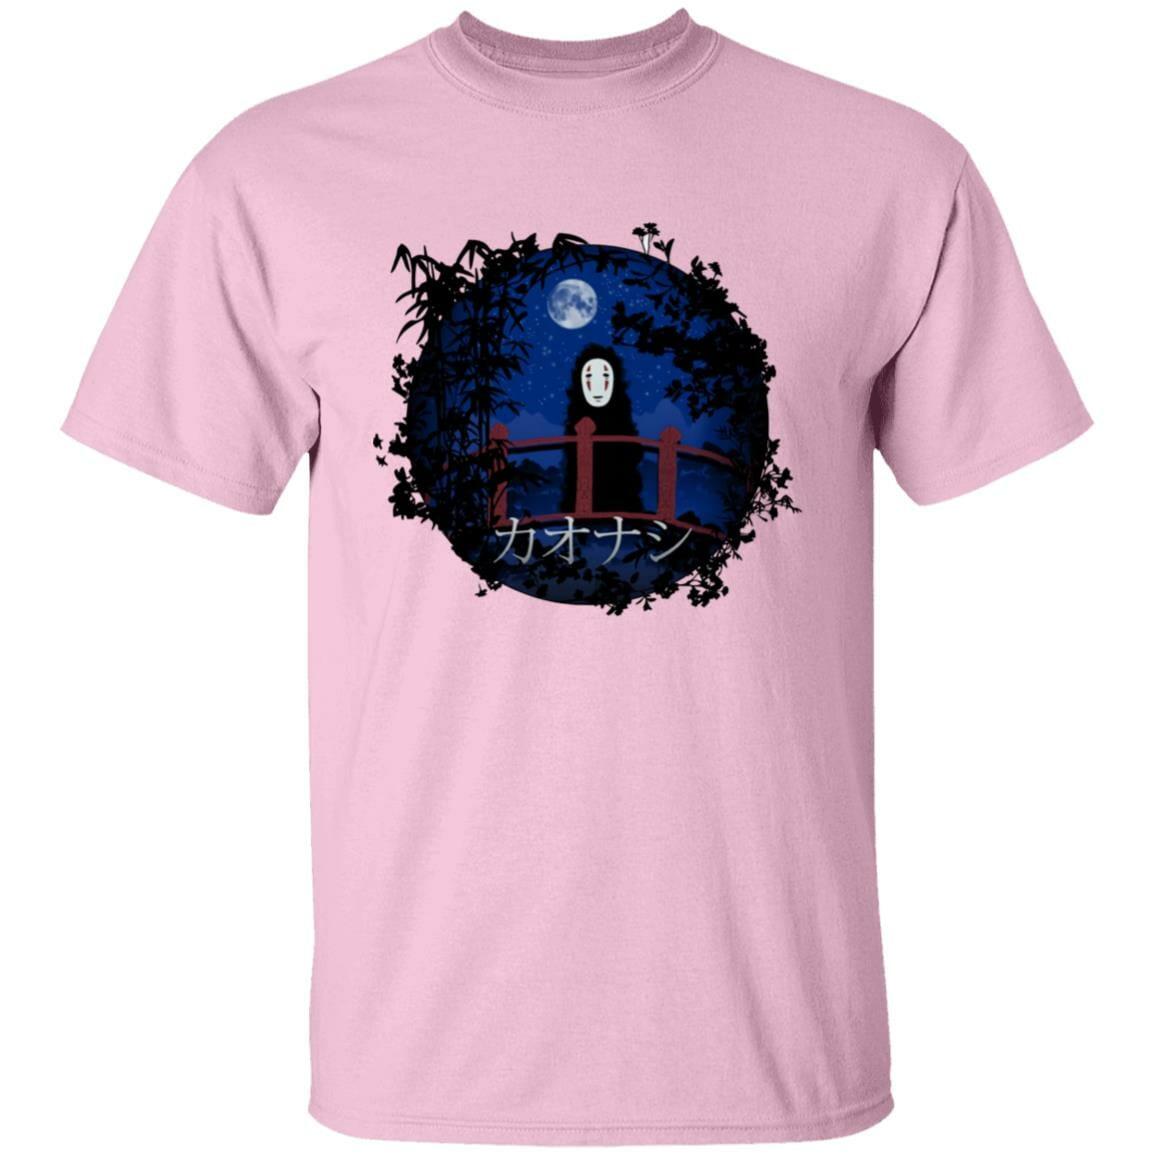 Spirited Away Kaonashi No Face by the blue Moon T Shirt